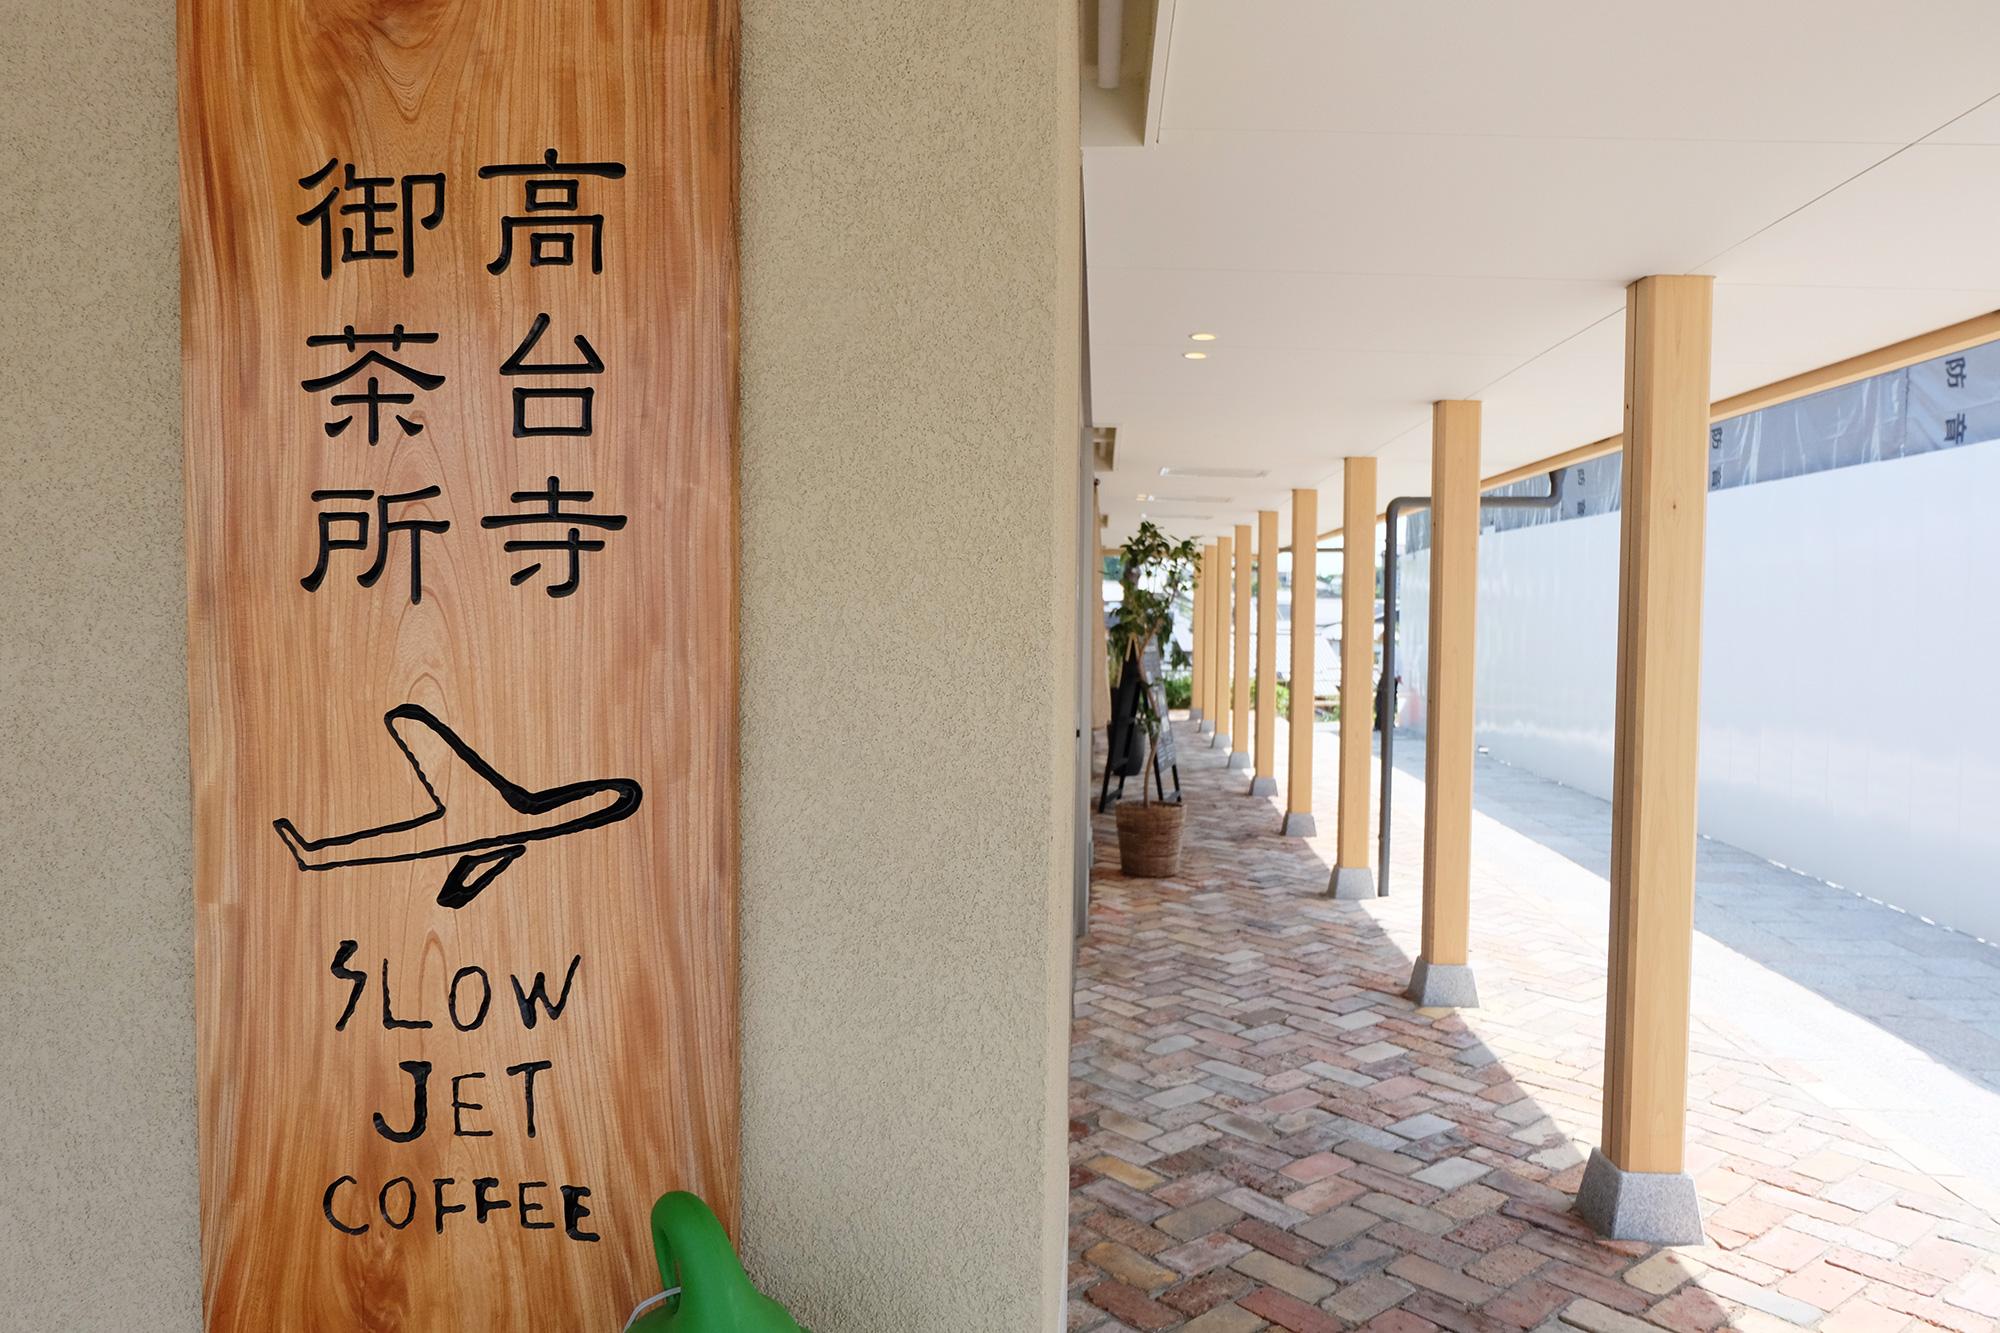 SLOW JET COFFEE 高台寺 スロージェットコーヒー